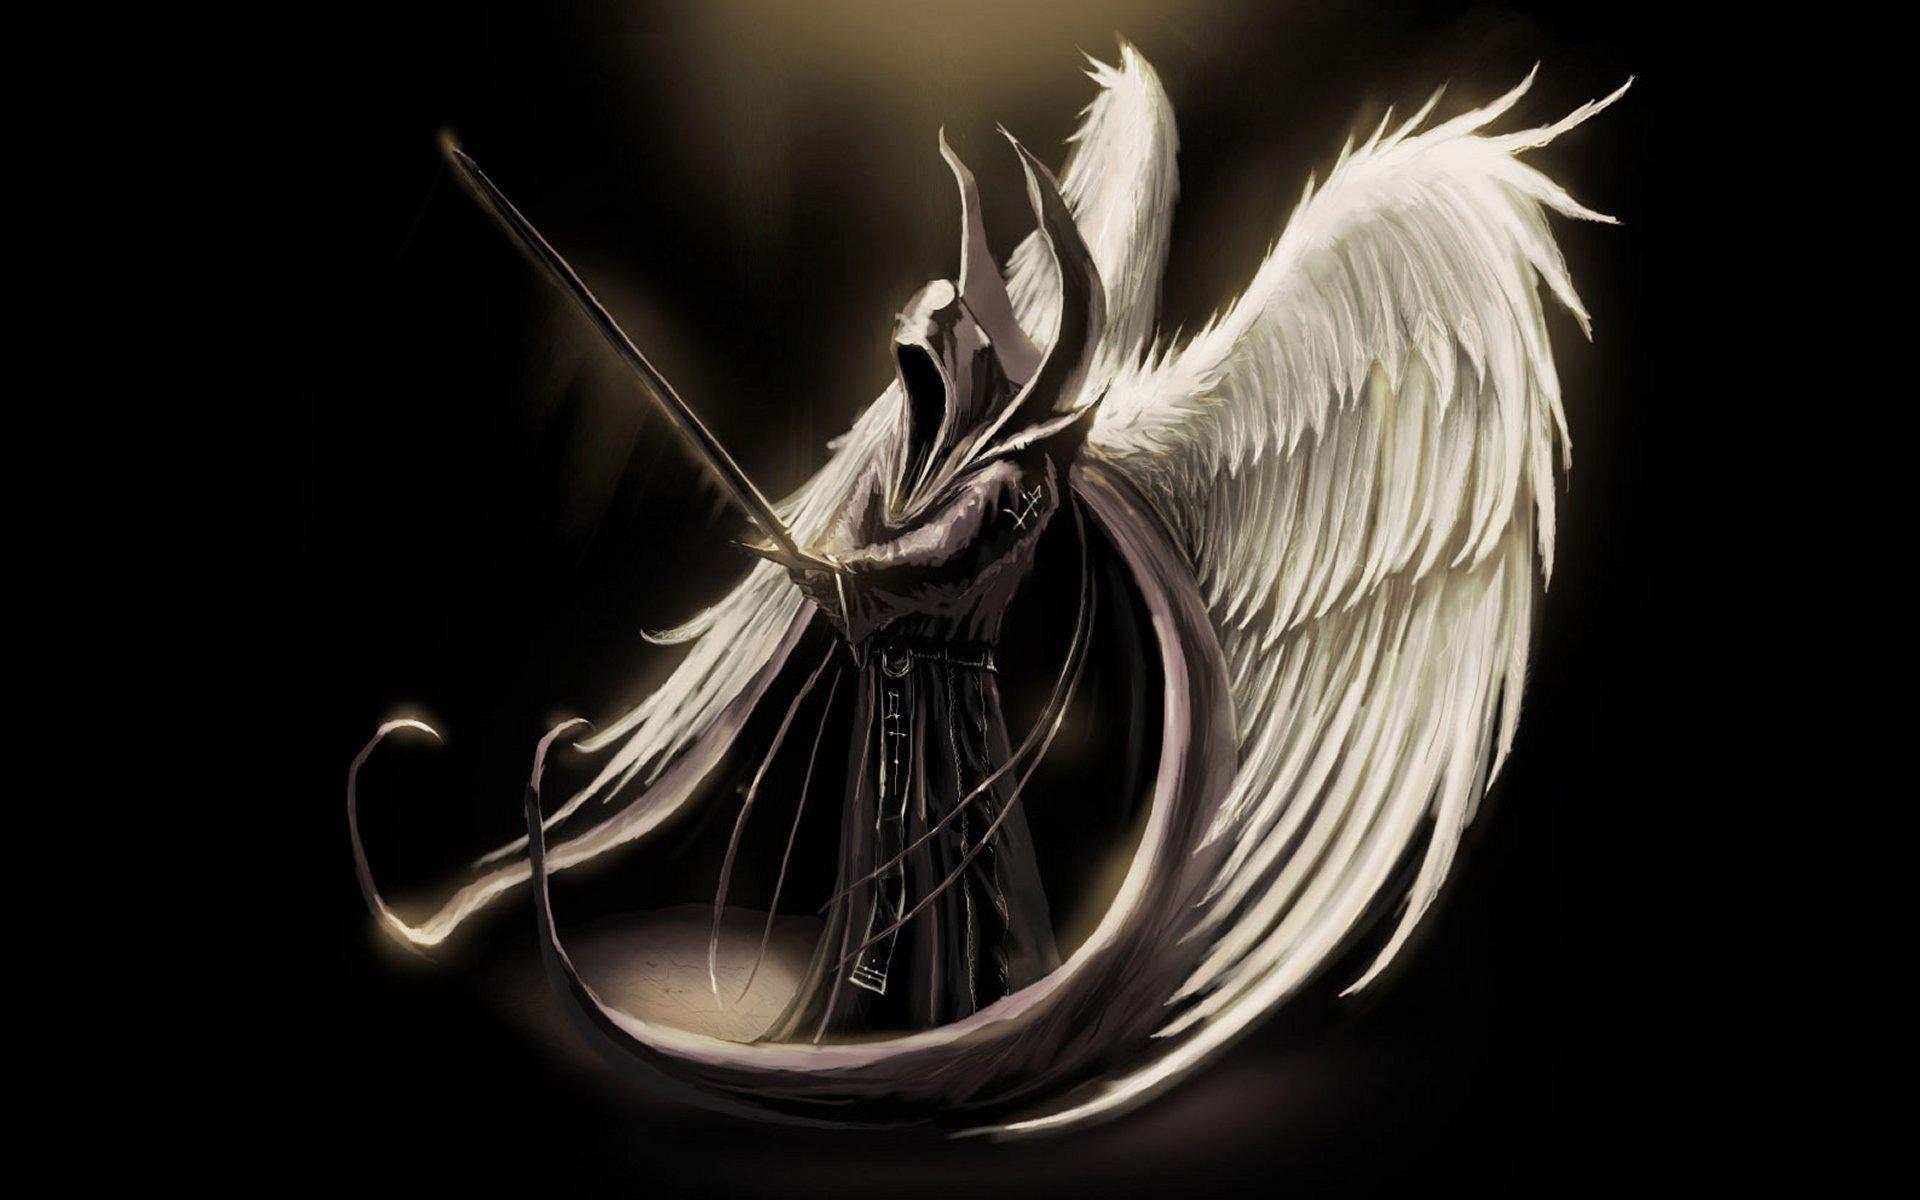 Pin By Michael Bays On Asl Stuff Angel Wallpaper Warriors Wallpaper Angel Warrior